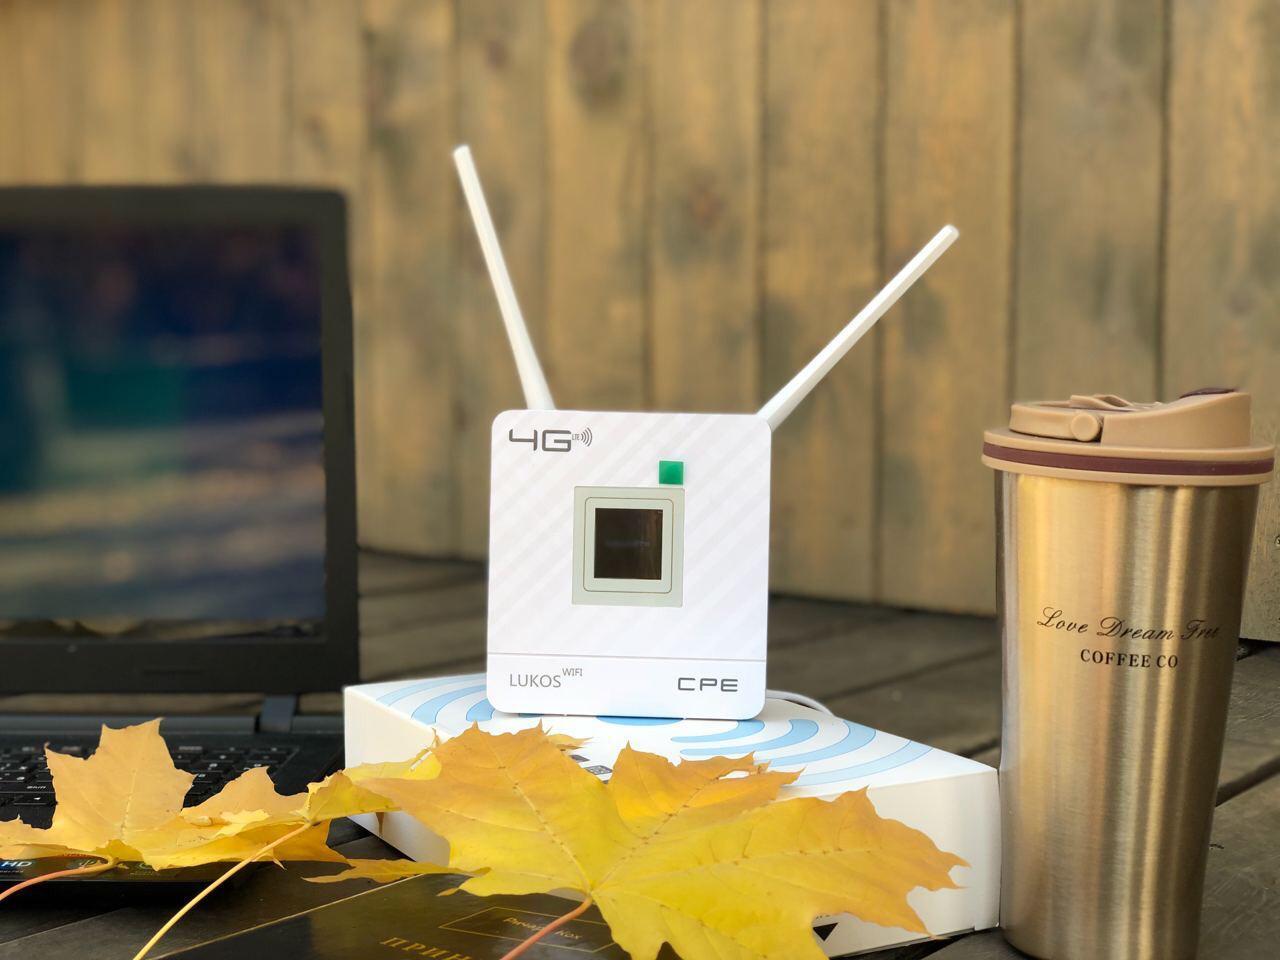 Беспроводной 4G LTE WiFi Модем Роутер CPF903 Алтел Актив Билайн Теле2 - фото 2